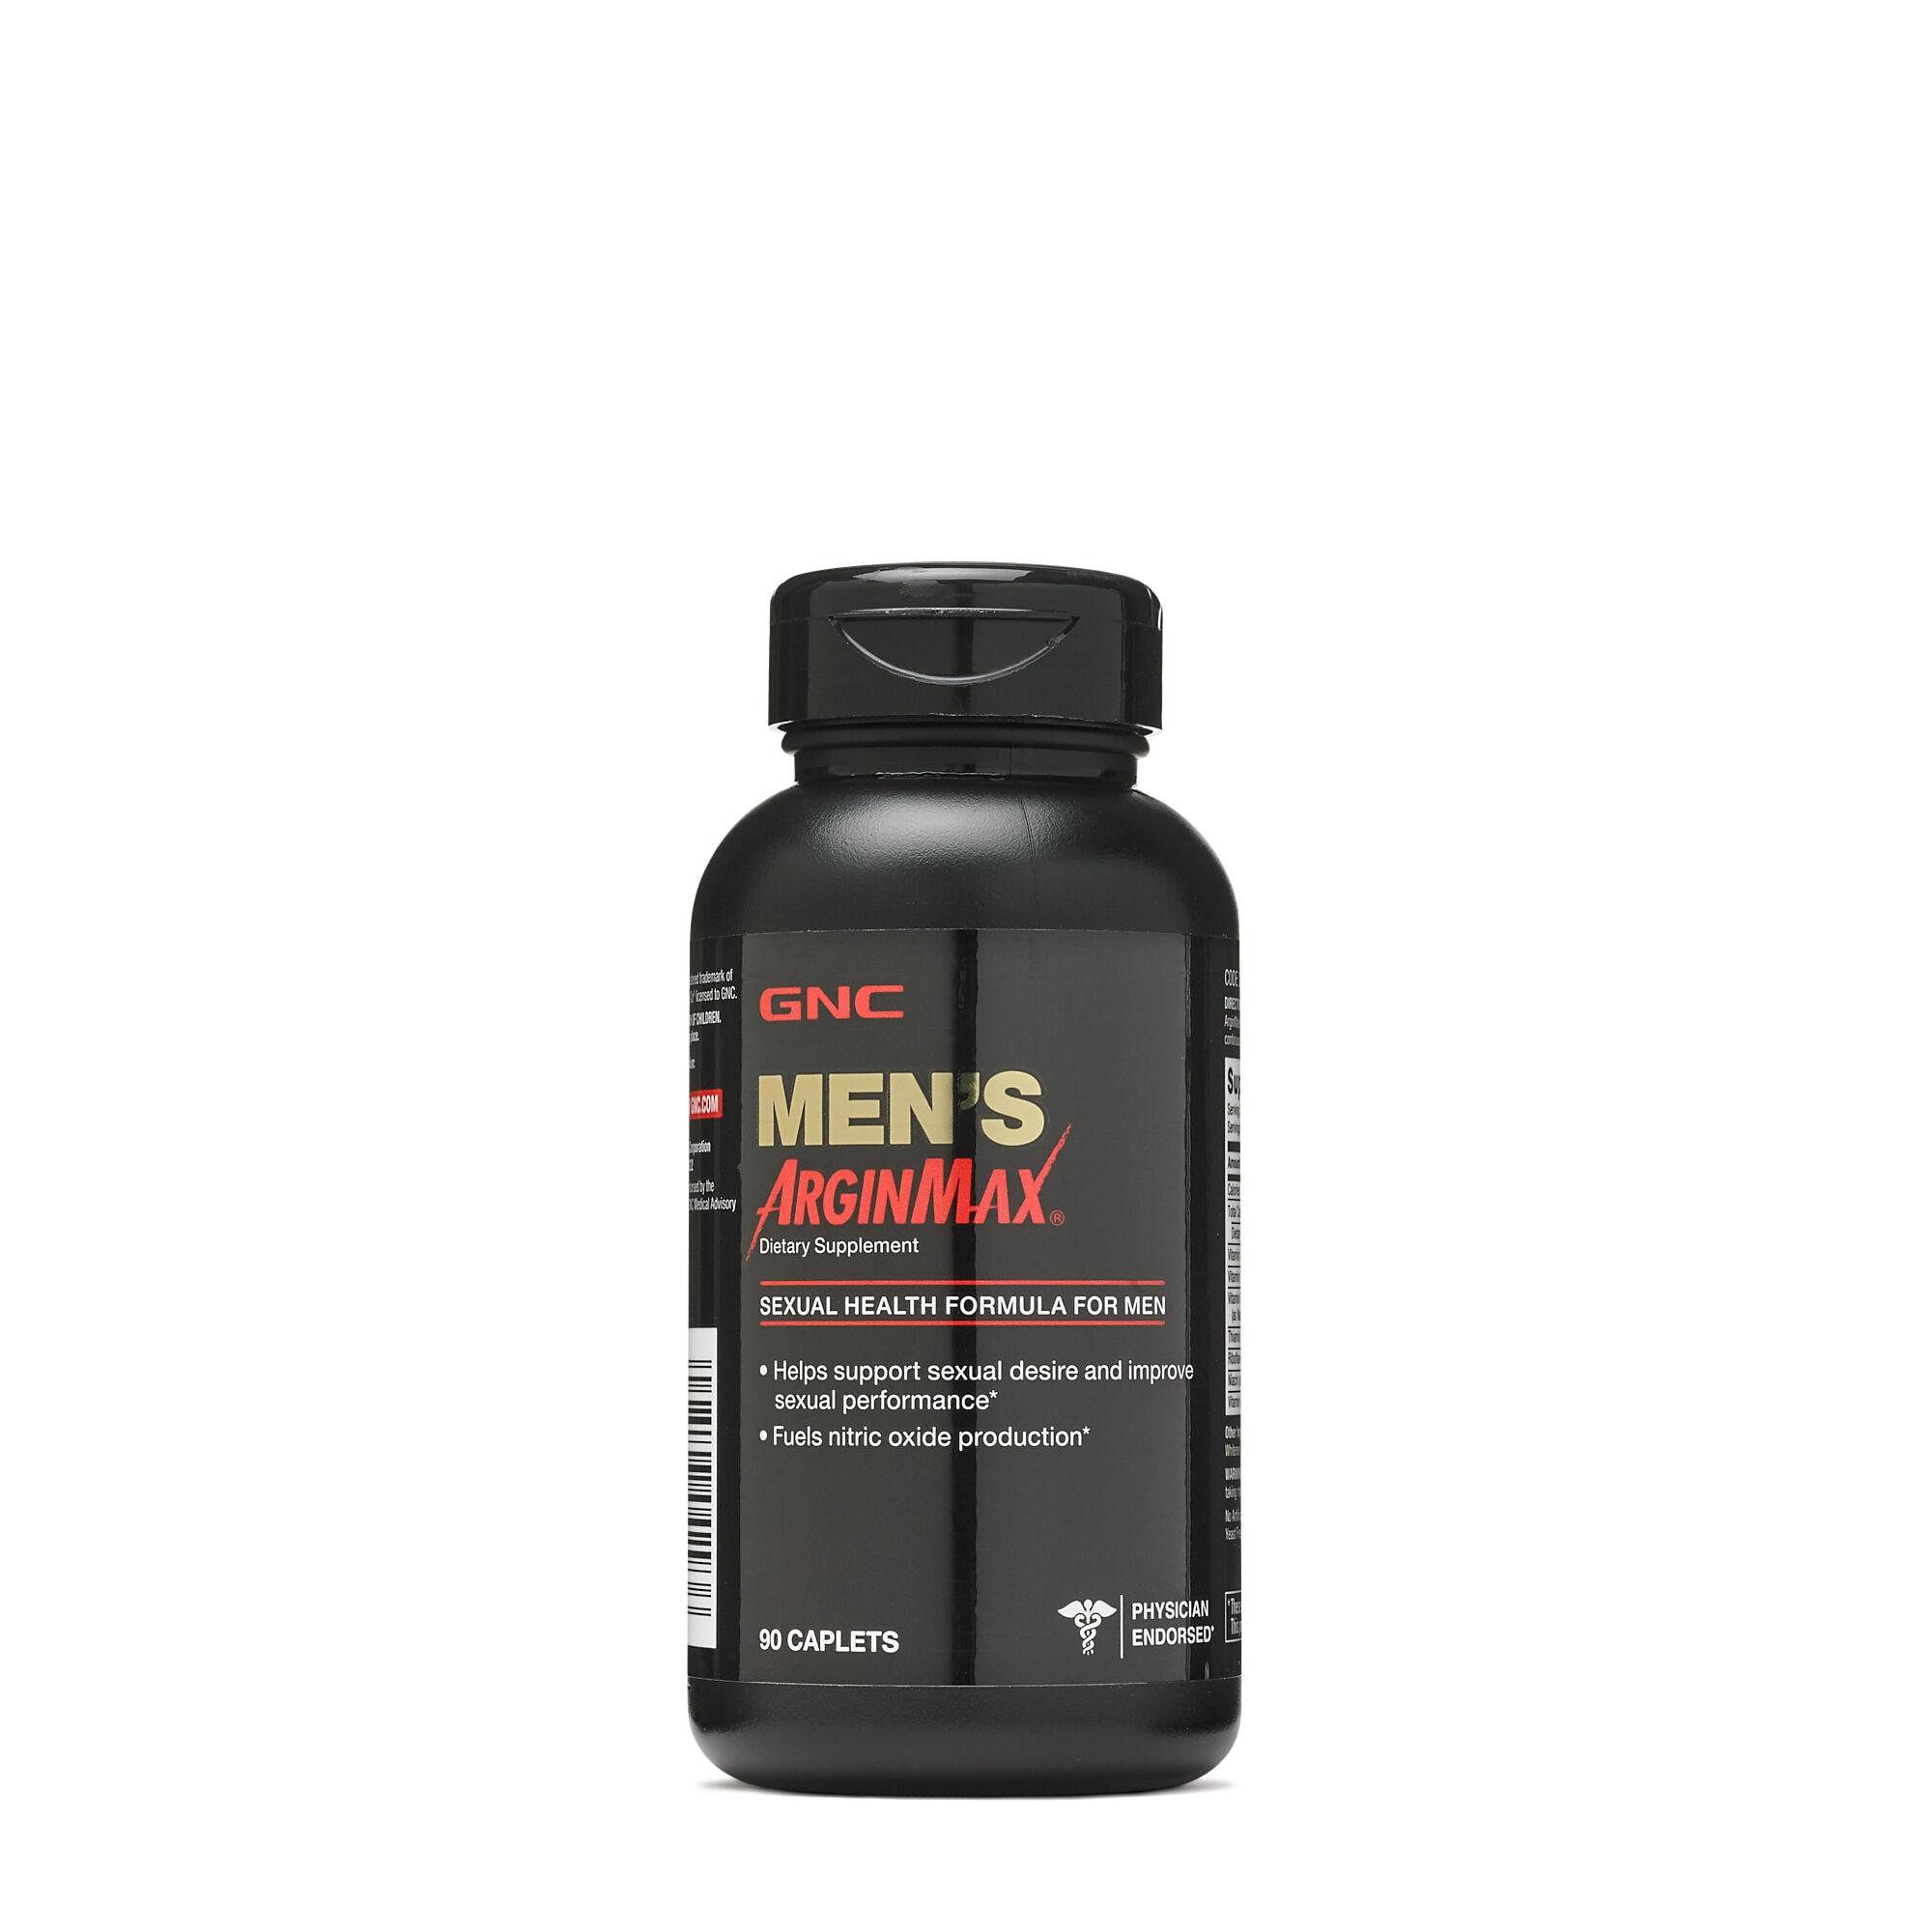 Men's ArginMax Sexual Health Formula for Men 90 Caplets L-Arginine Ginseng multivitamin